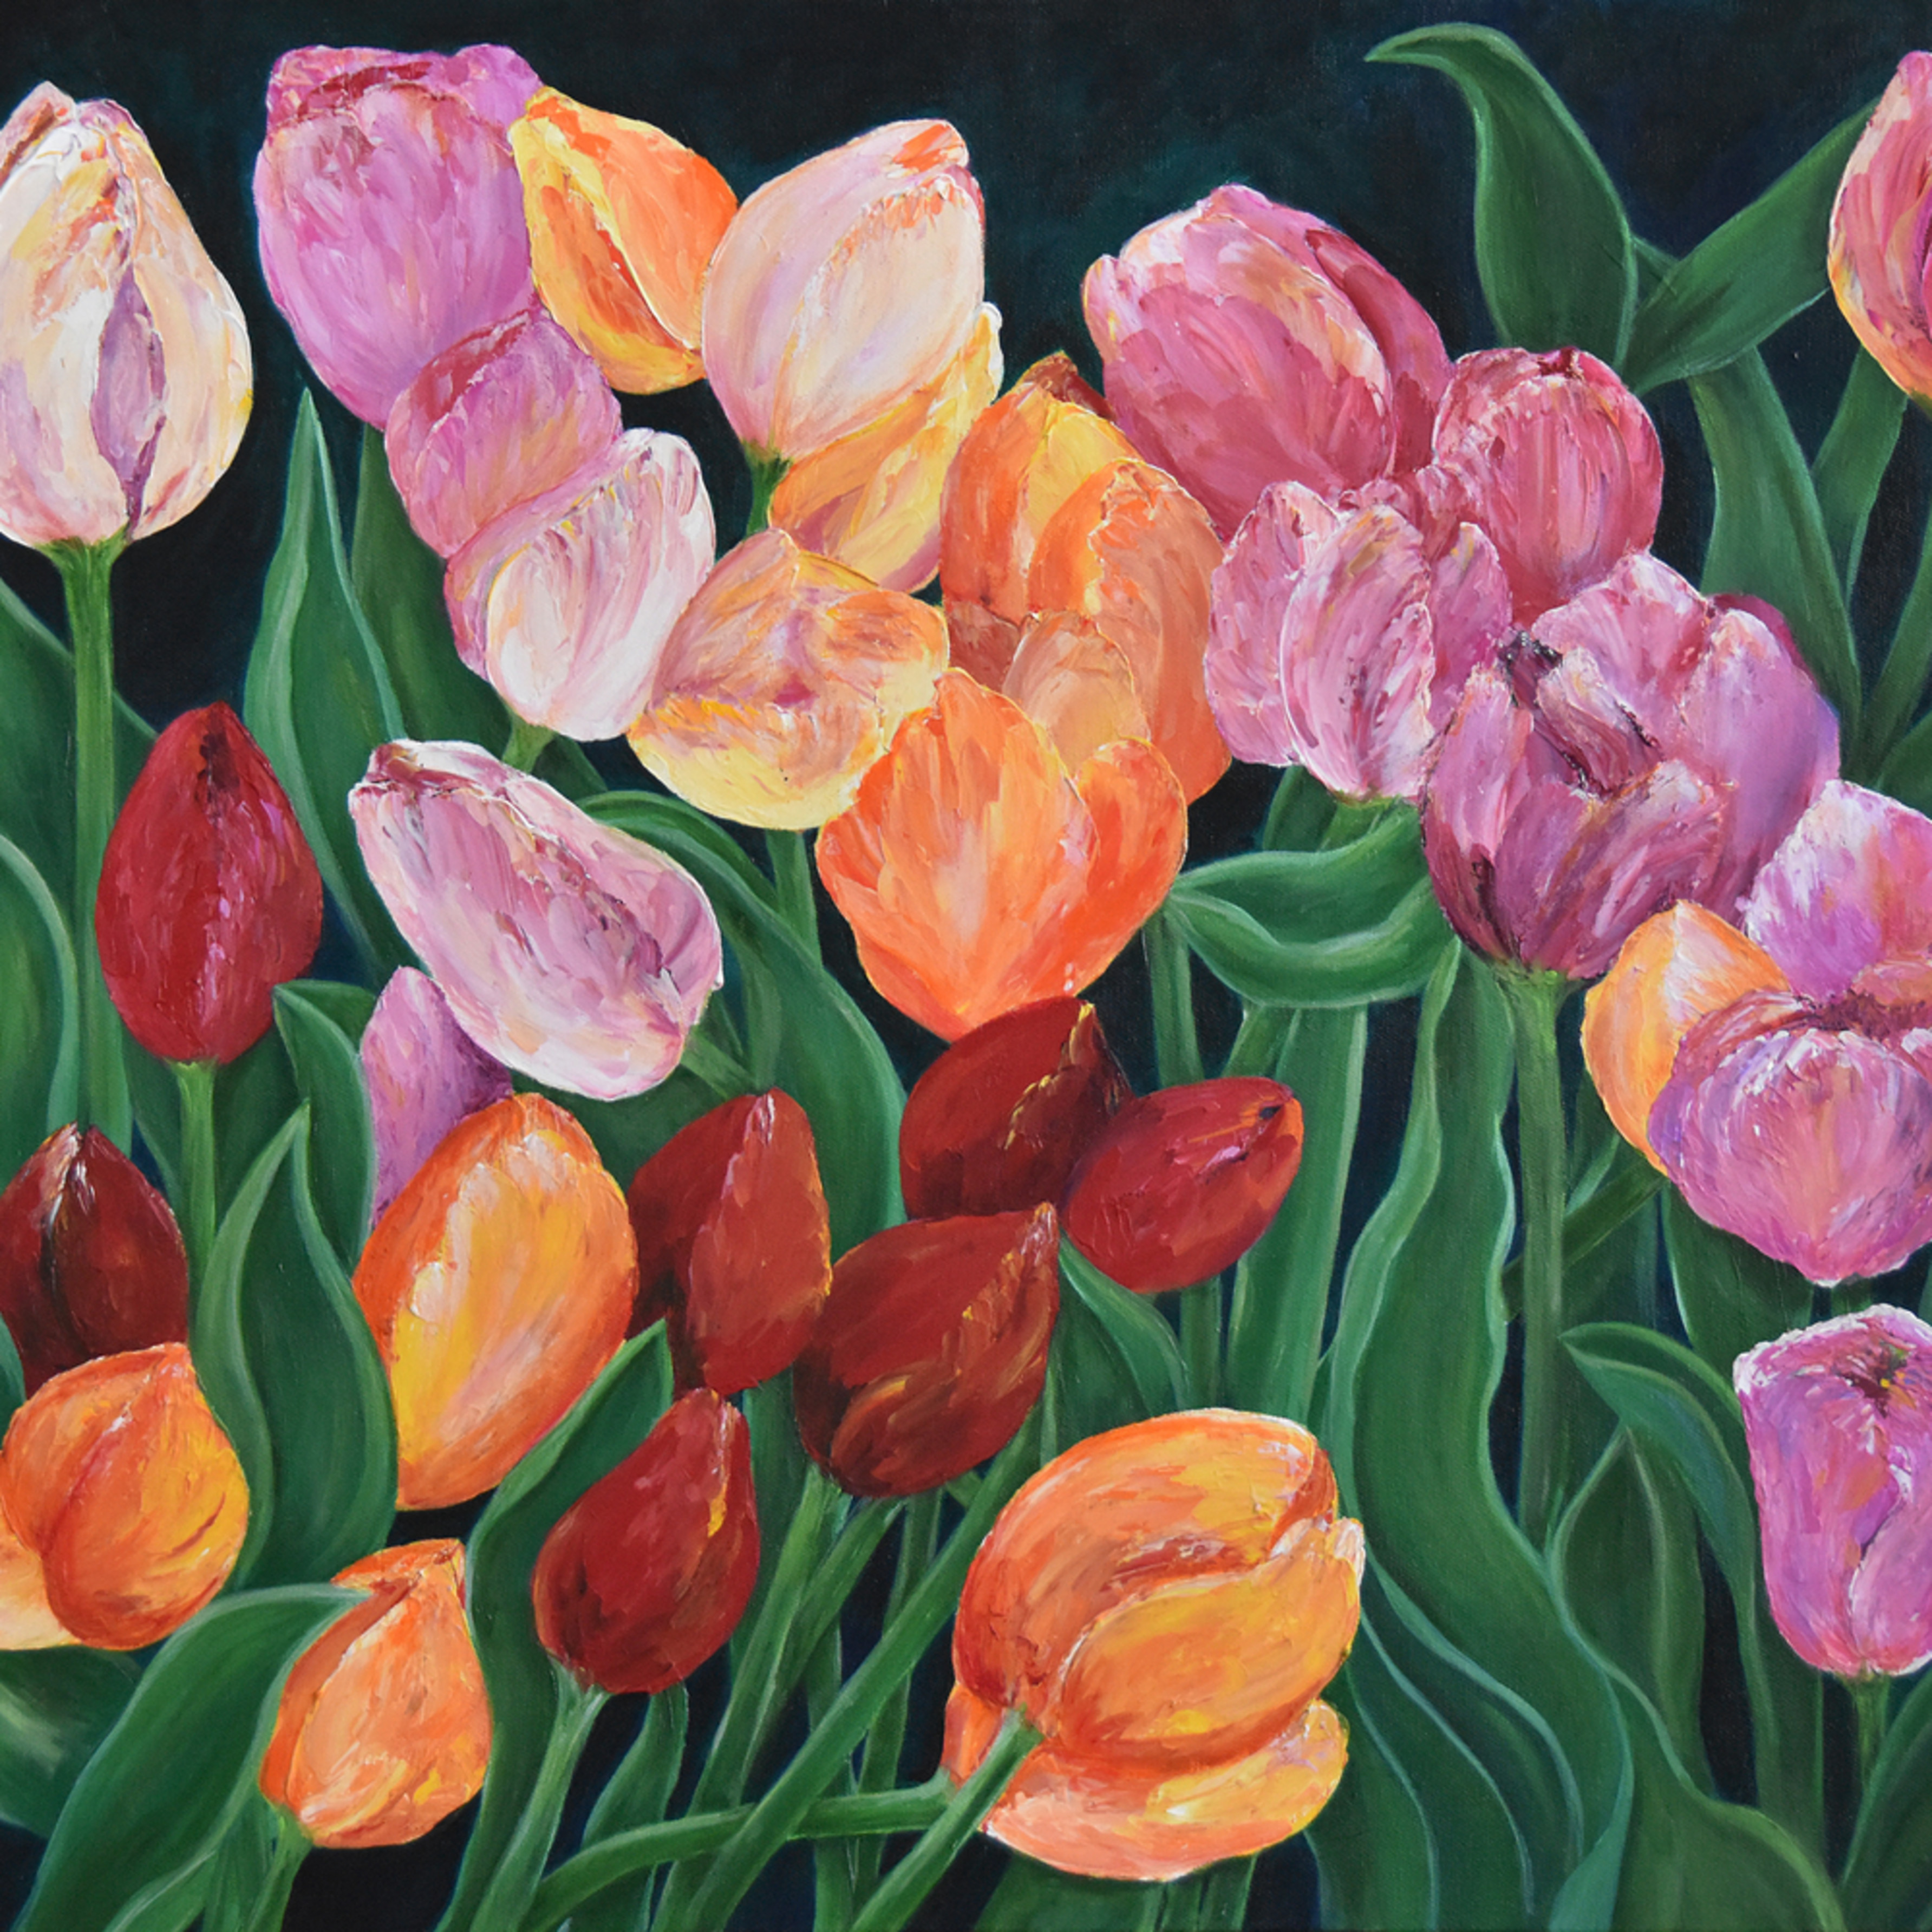 Tulips in switzerland bz62jl